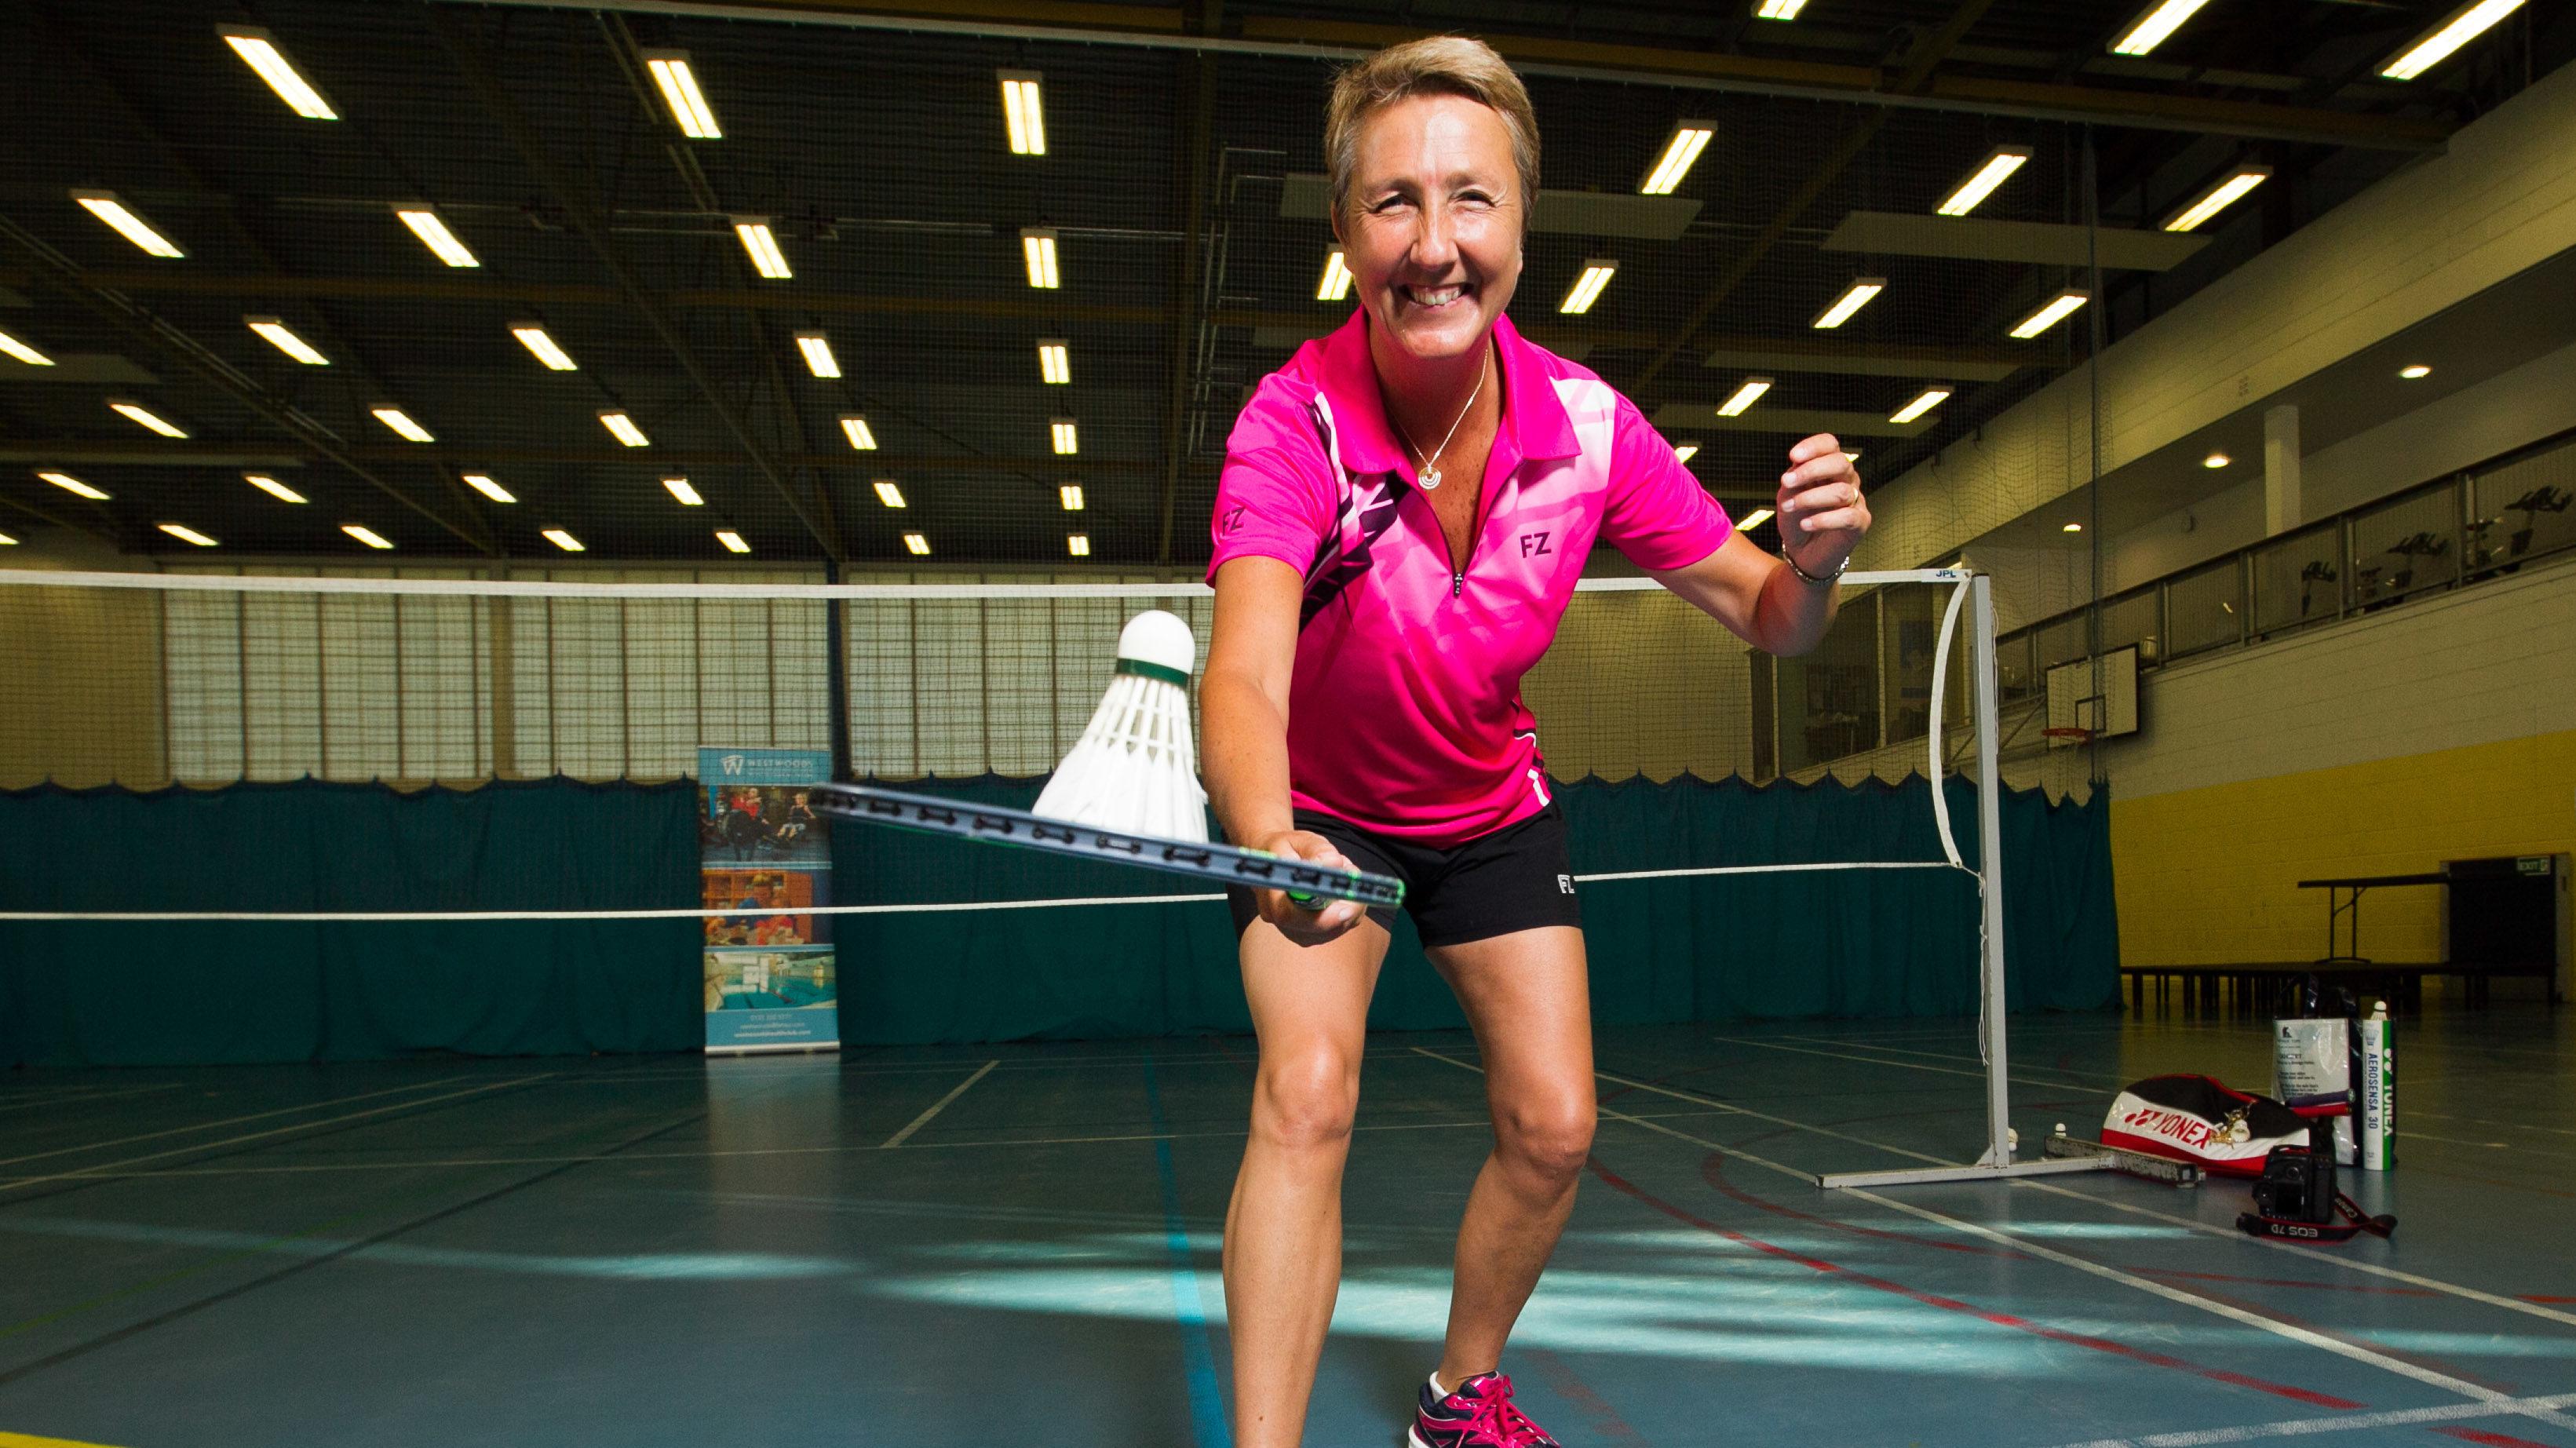 Scottish Taliban attack survivor now set to be Paralympian